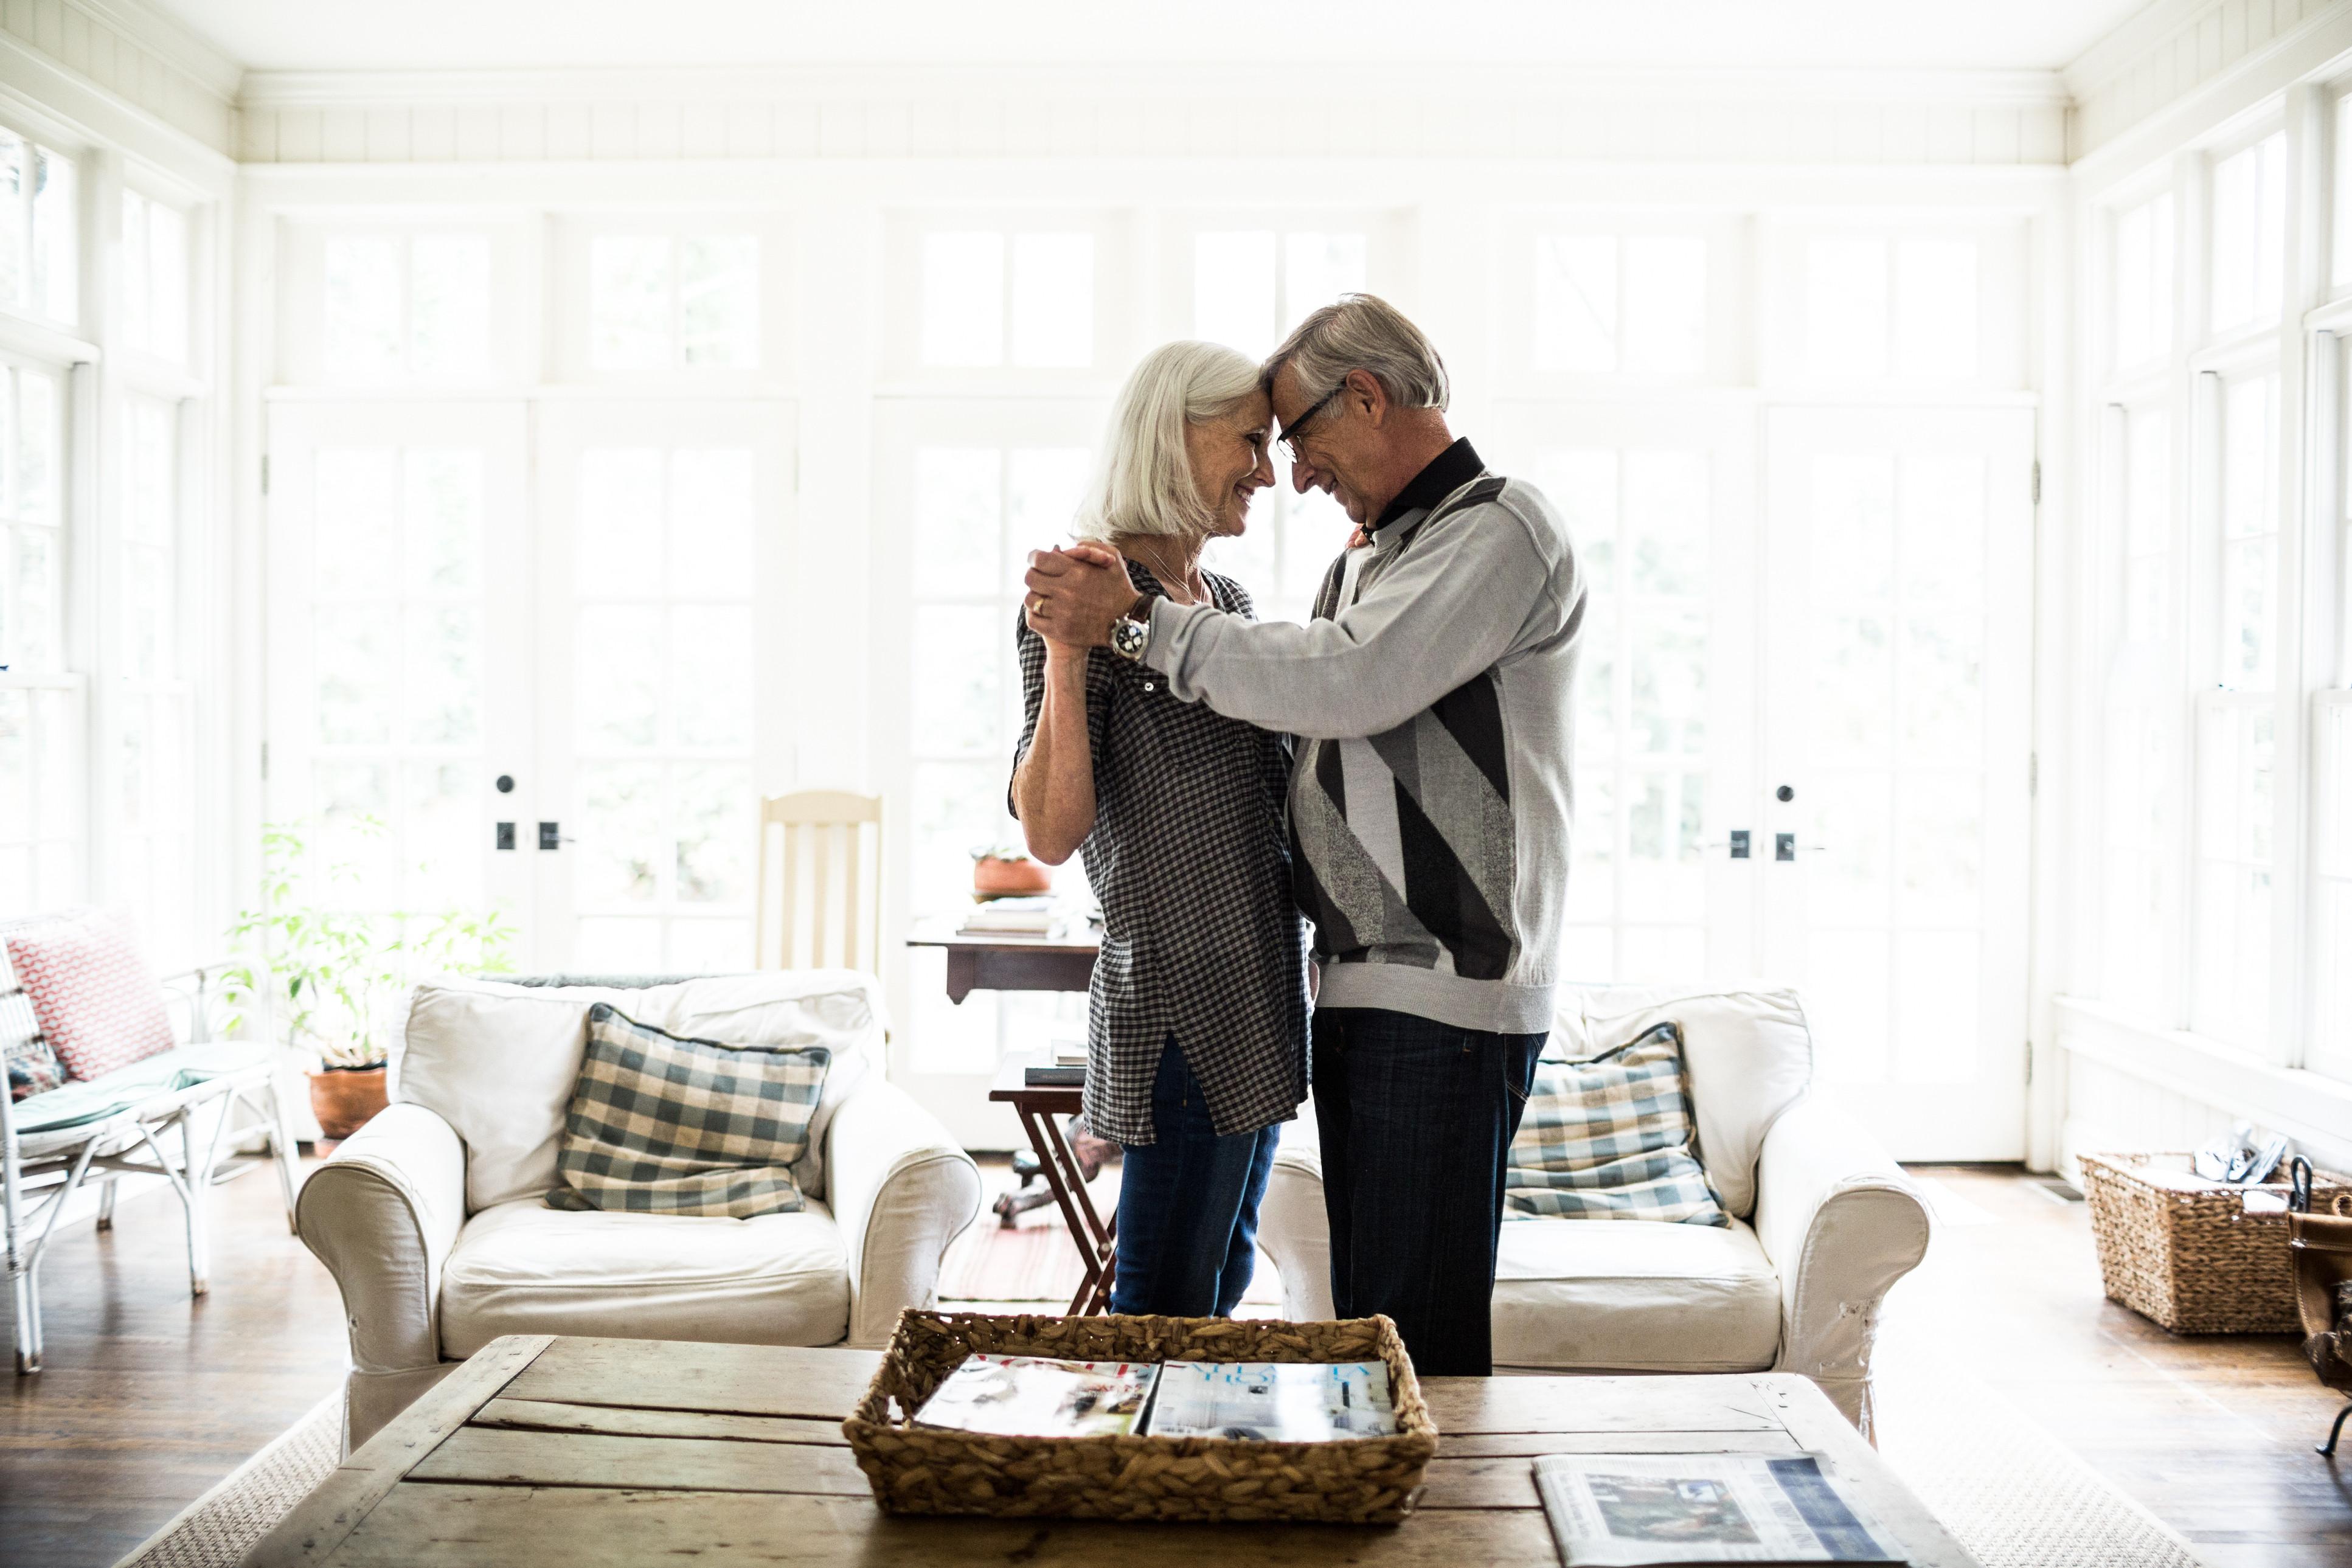 Sex in the elderly